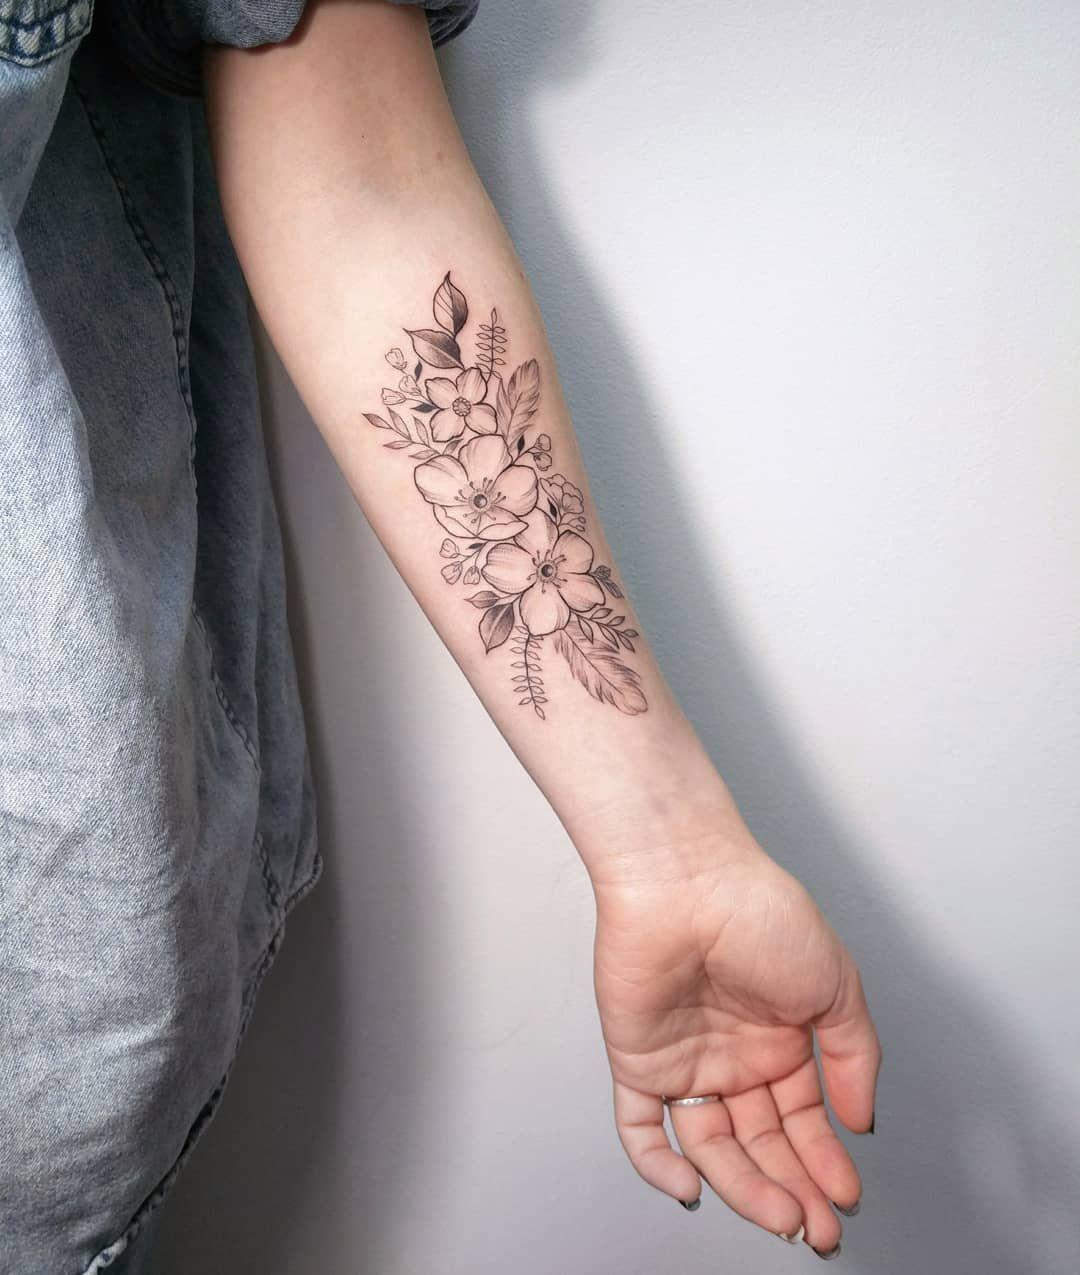 Pin On Cute Tattoos